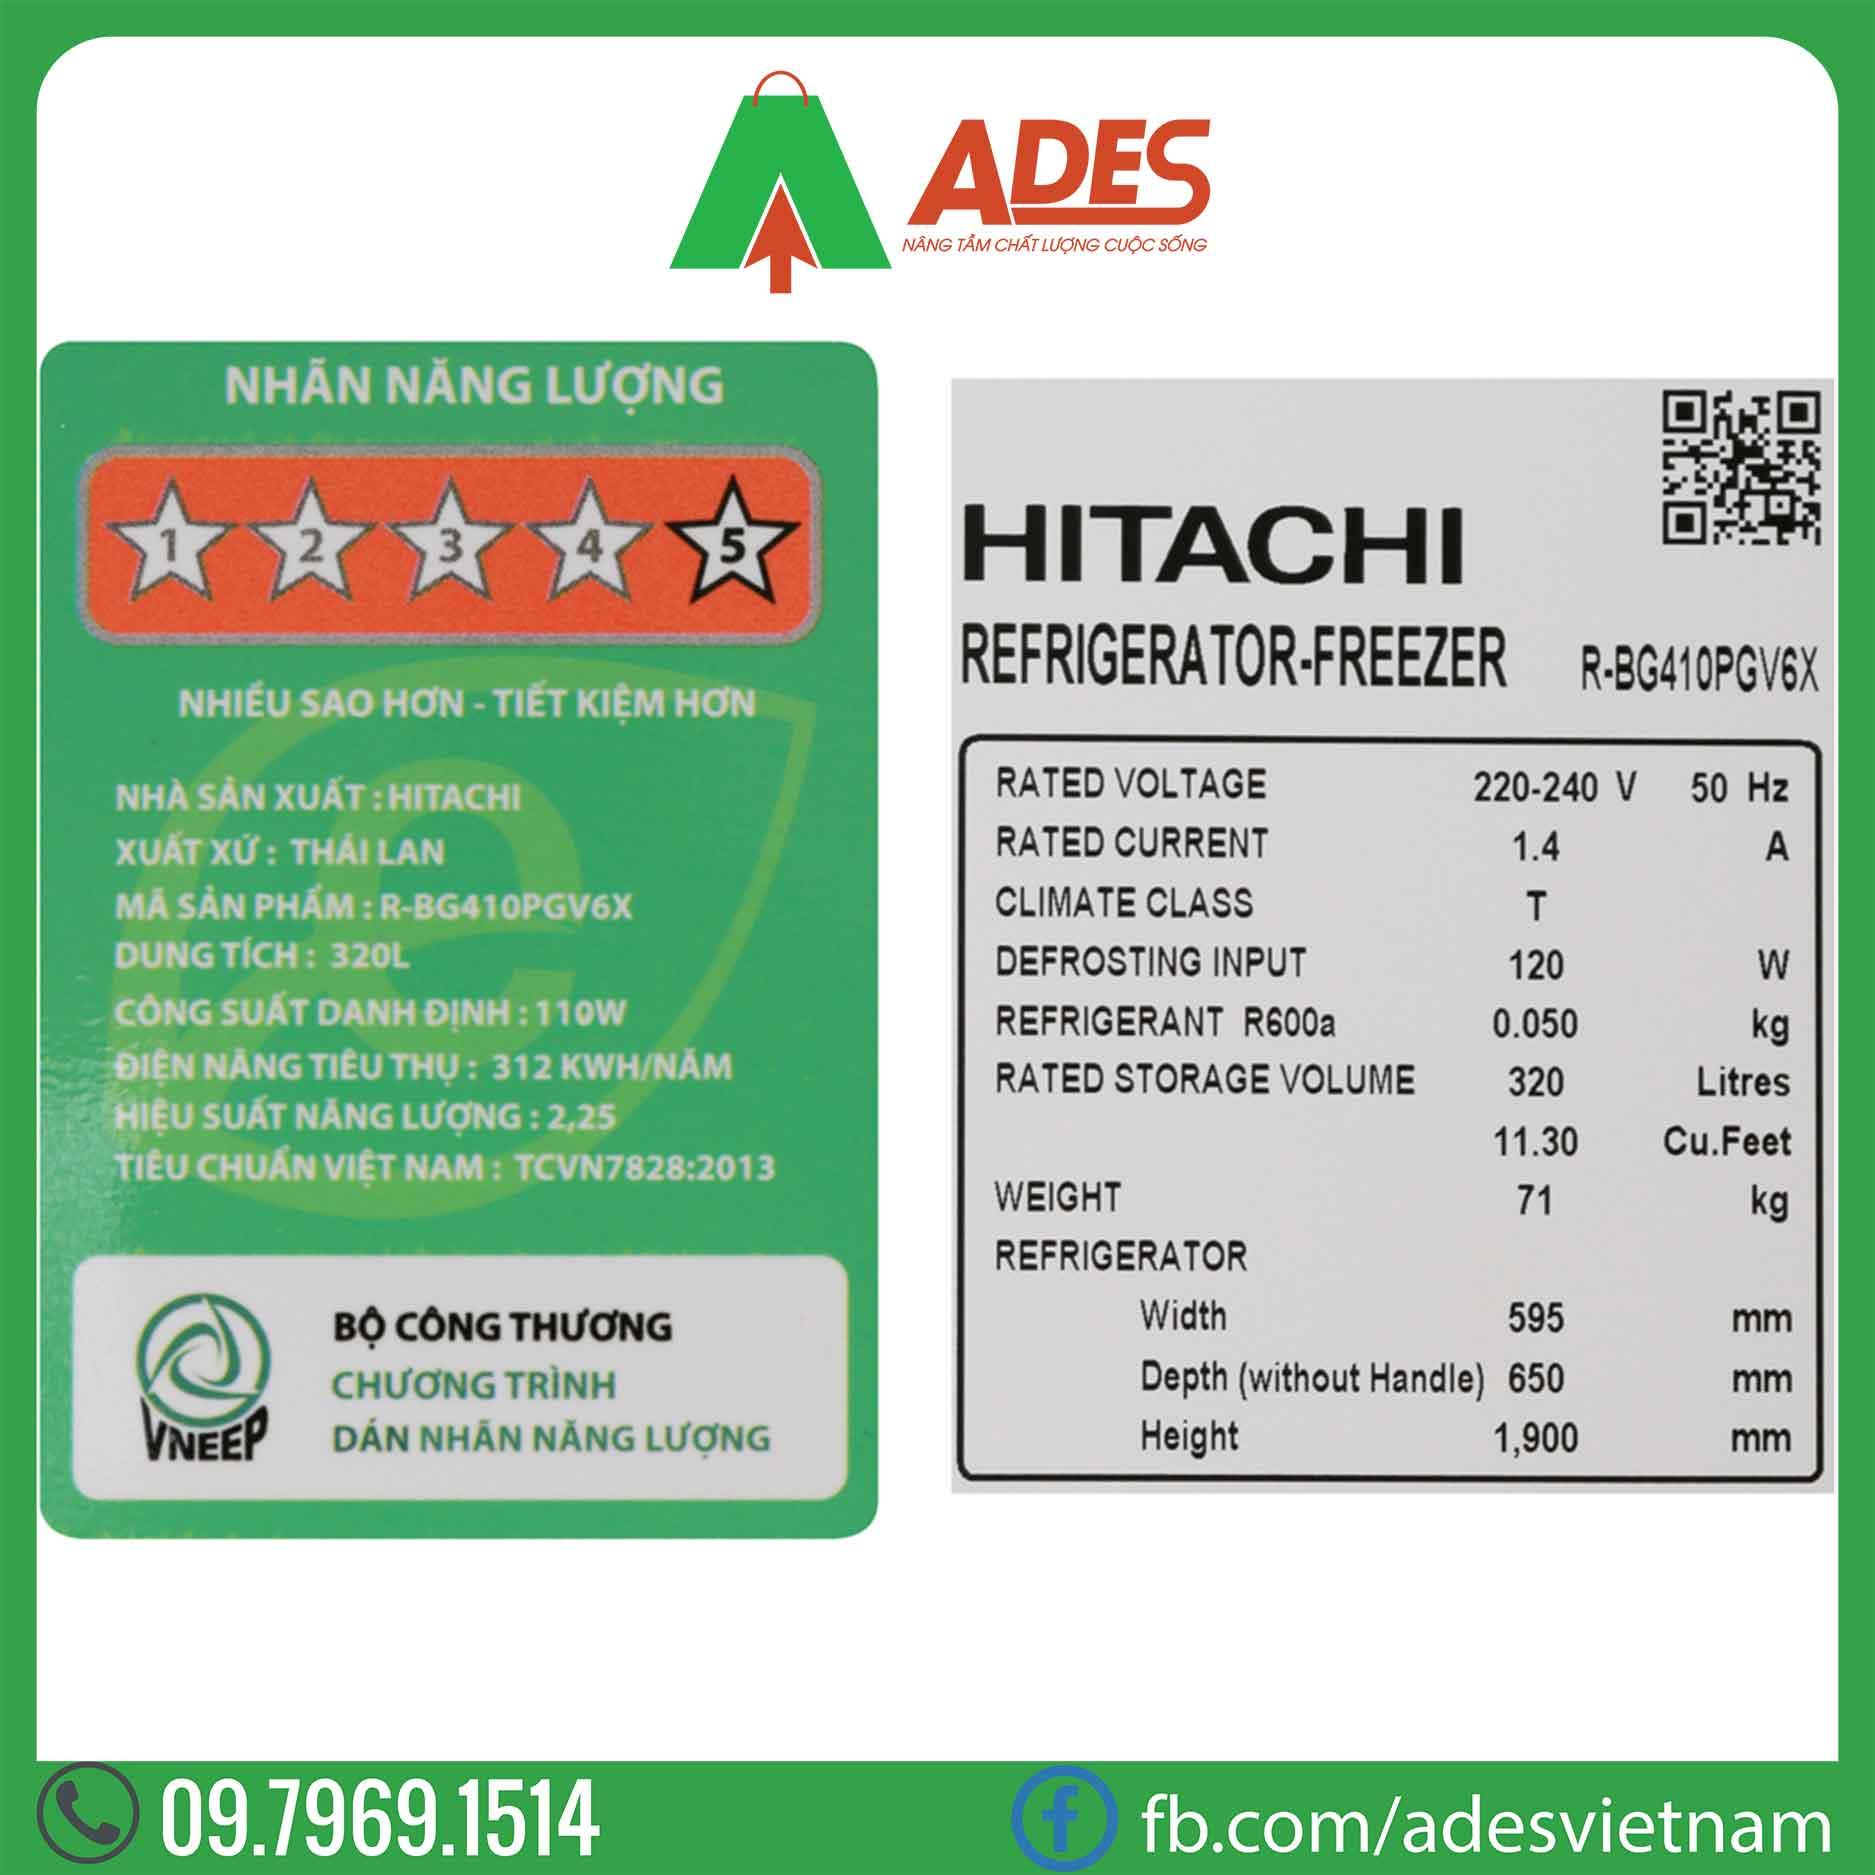 Tu lanh Hitachi Inverter R-BG410PGV6X GXR